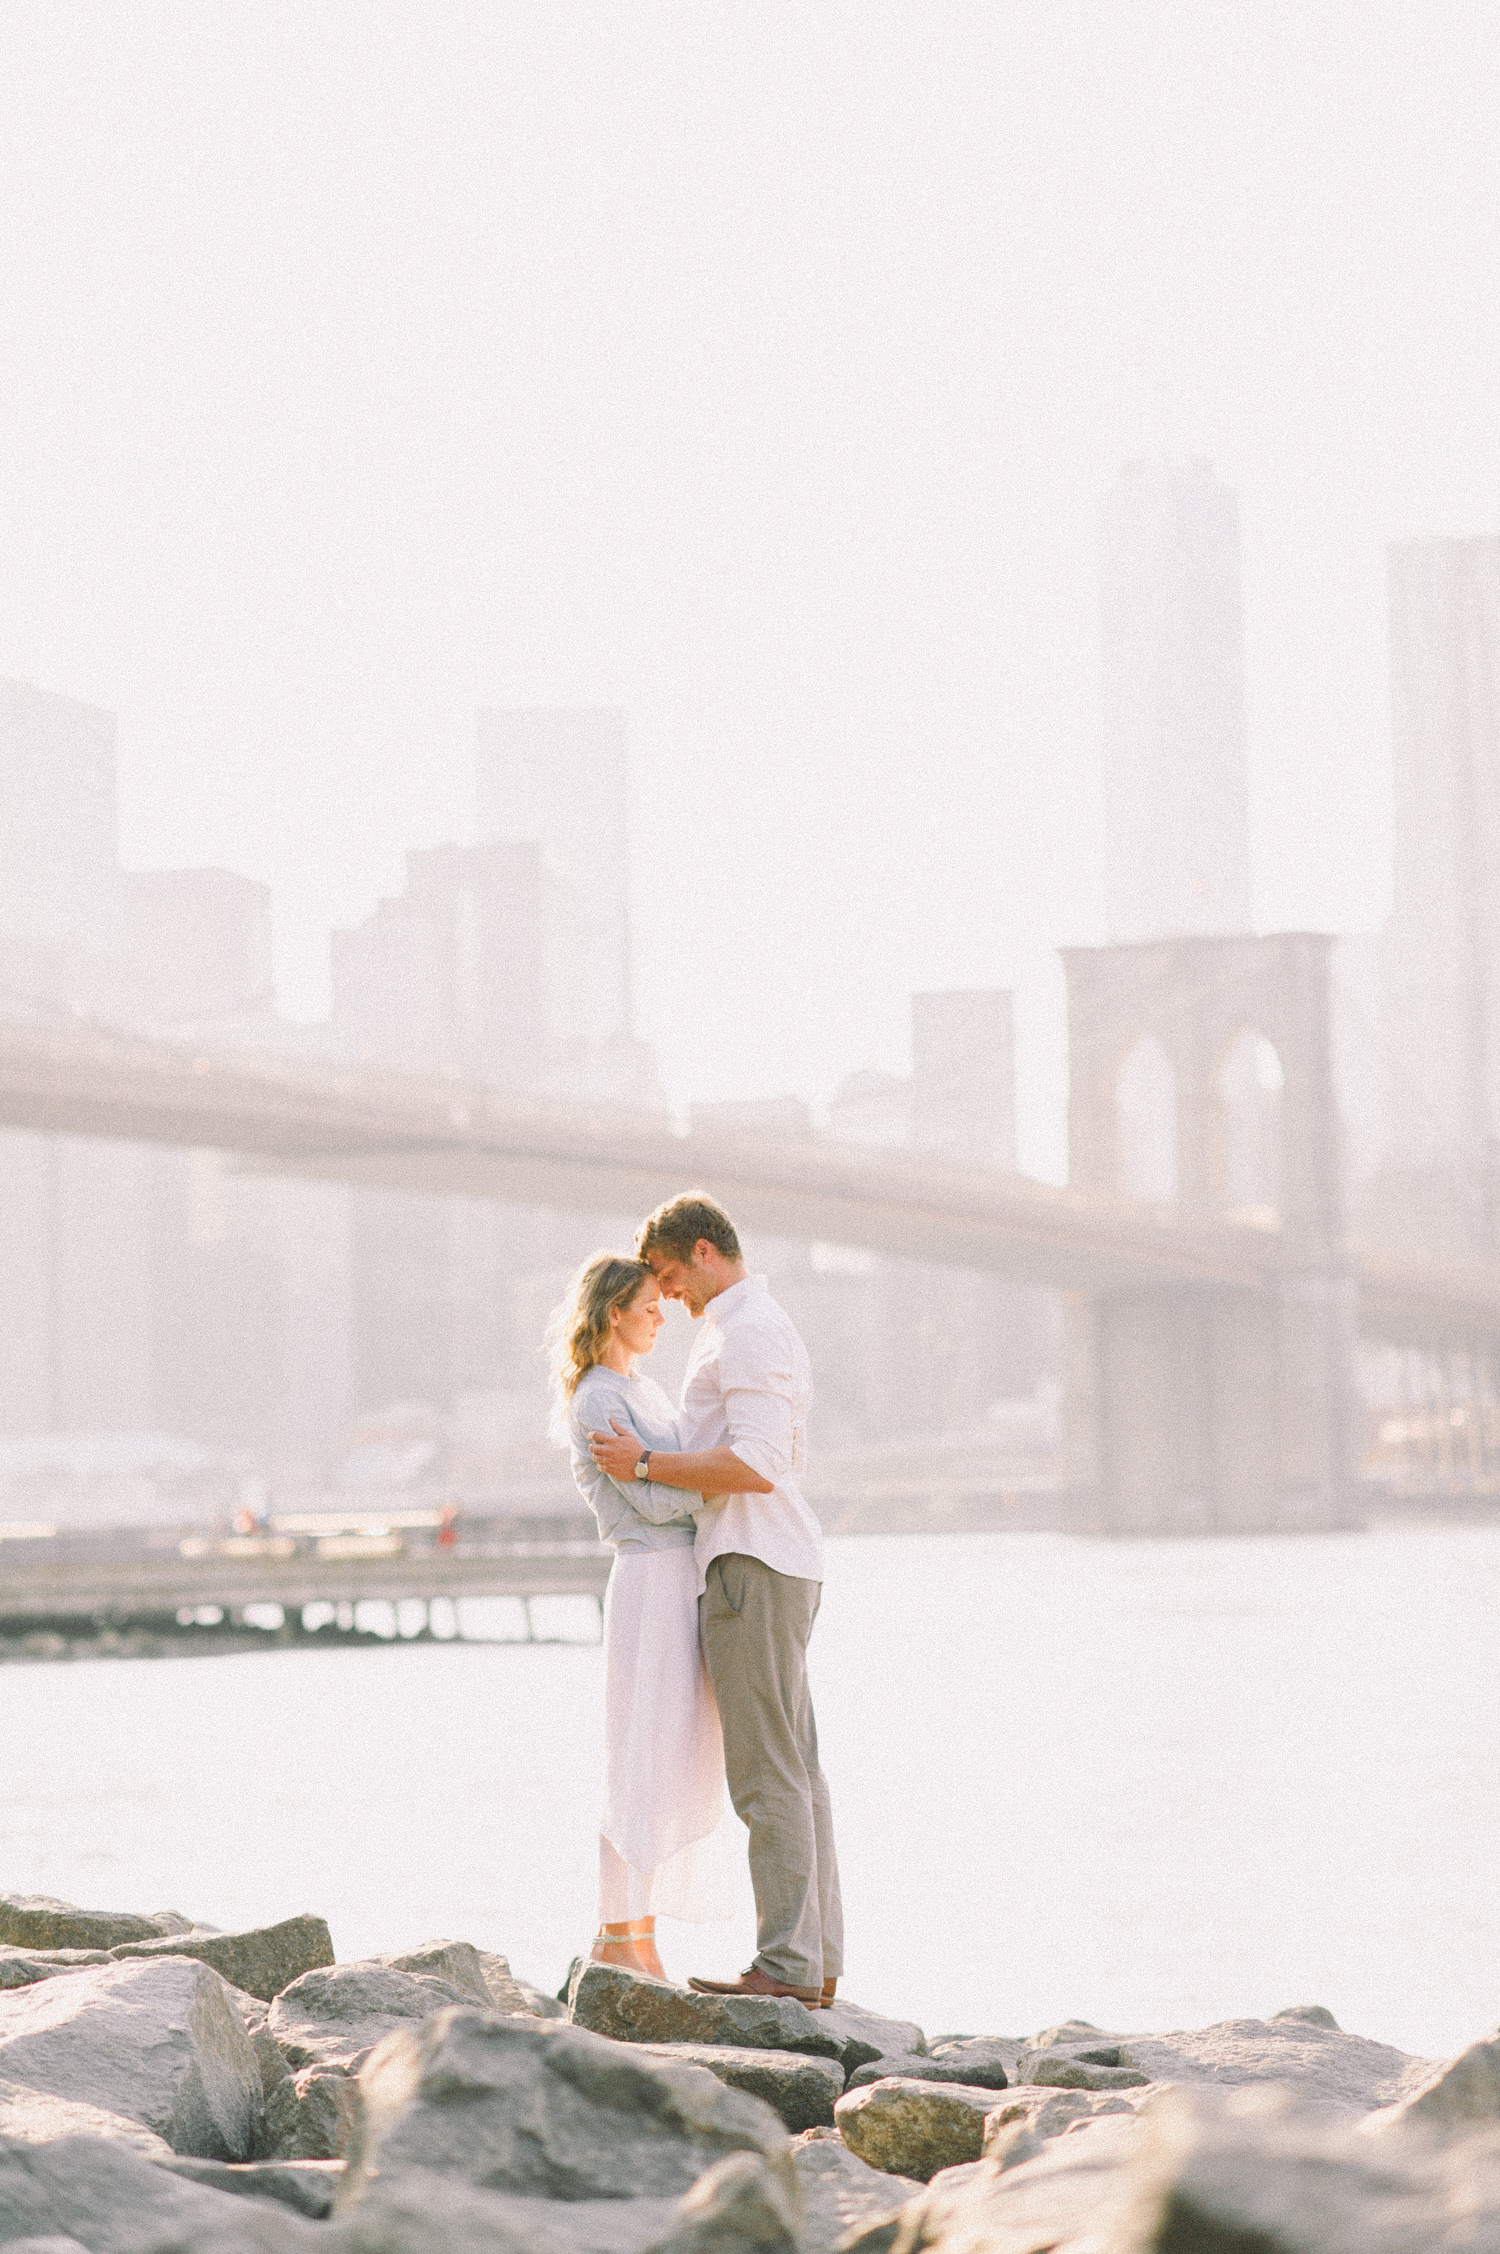 BrooklynBridge.Dumbo.Engagements5.jpg